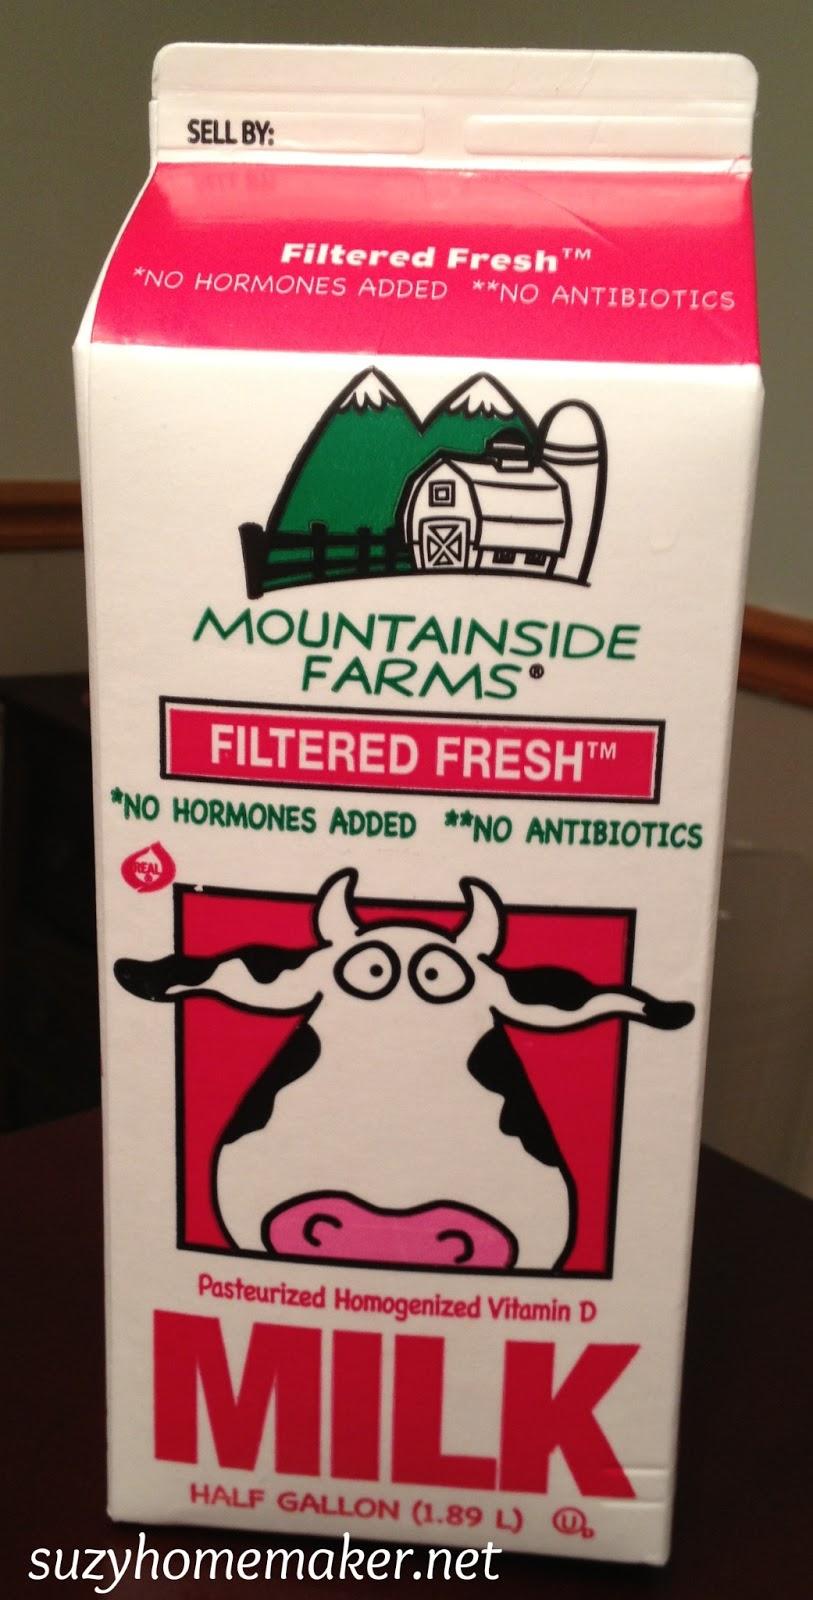 Is mountainside farms milk organic